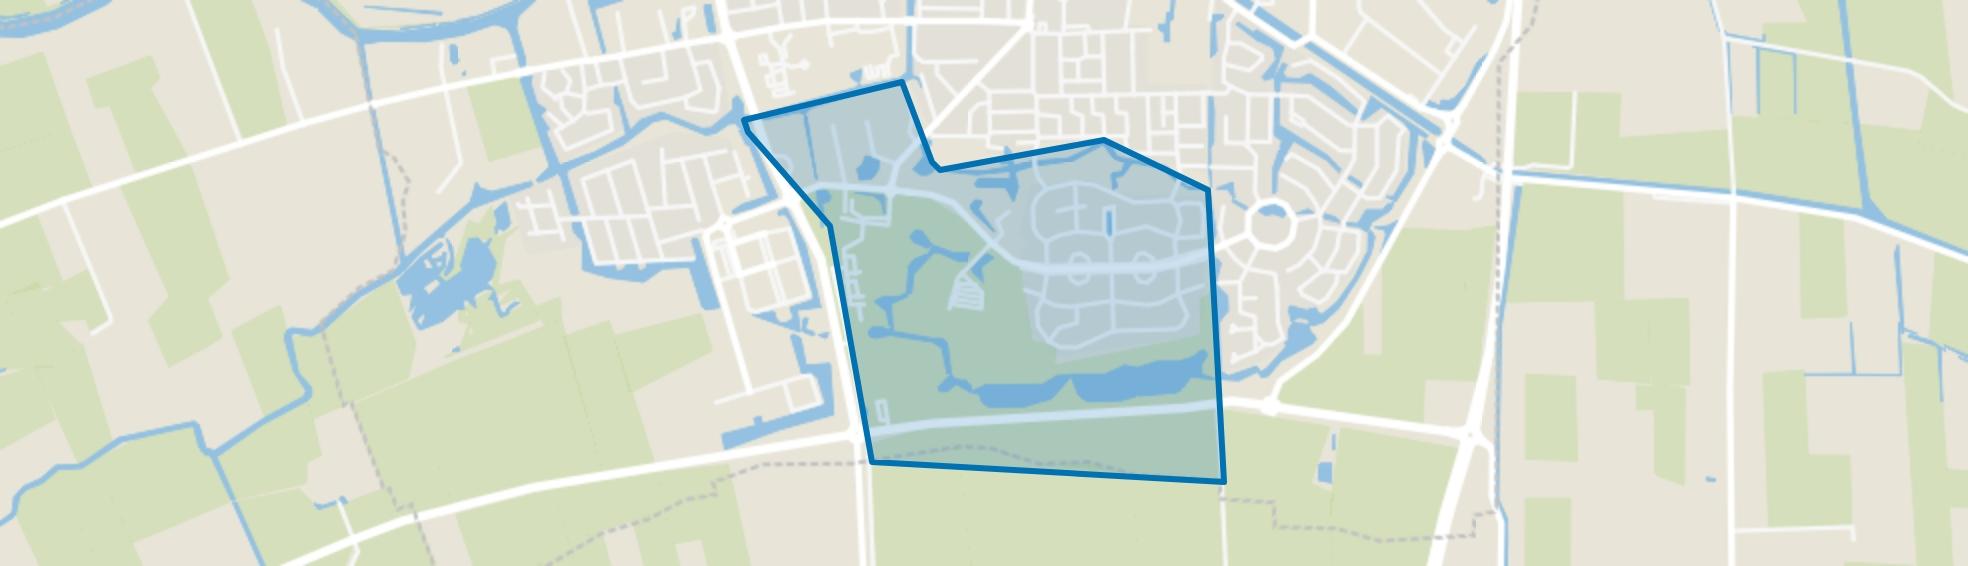 Dokkum Jantjeszeepolder, Dokkum map